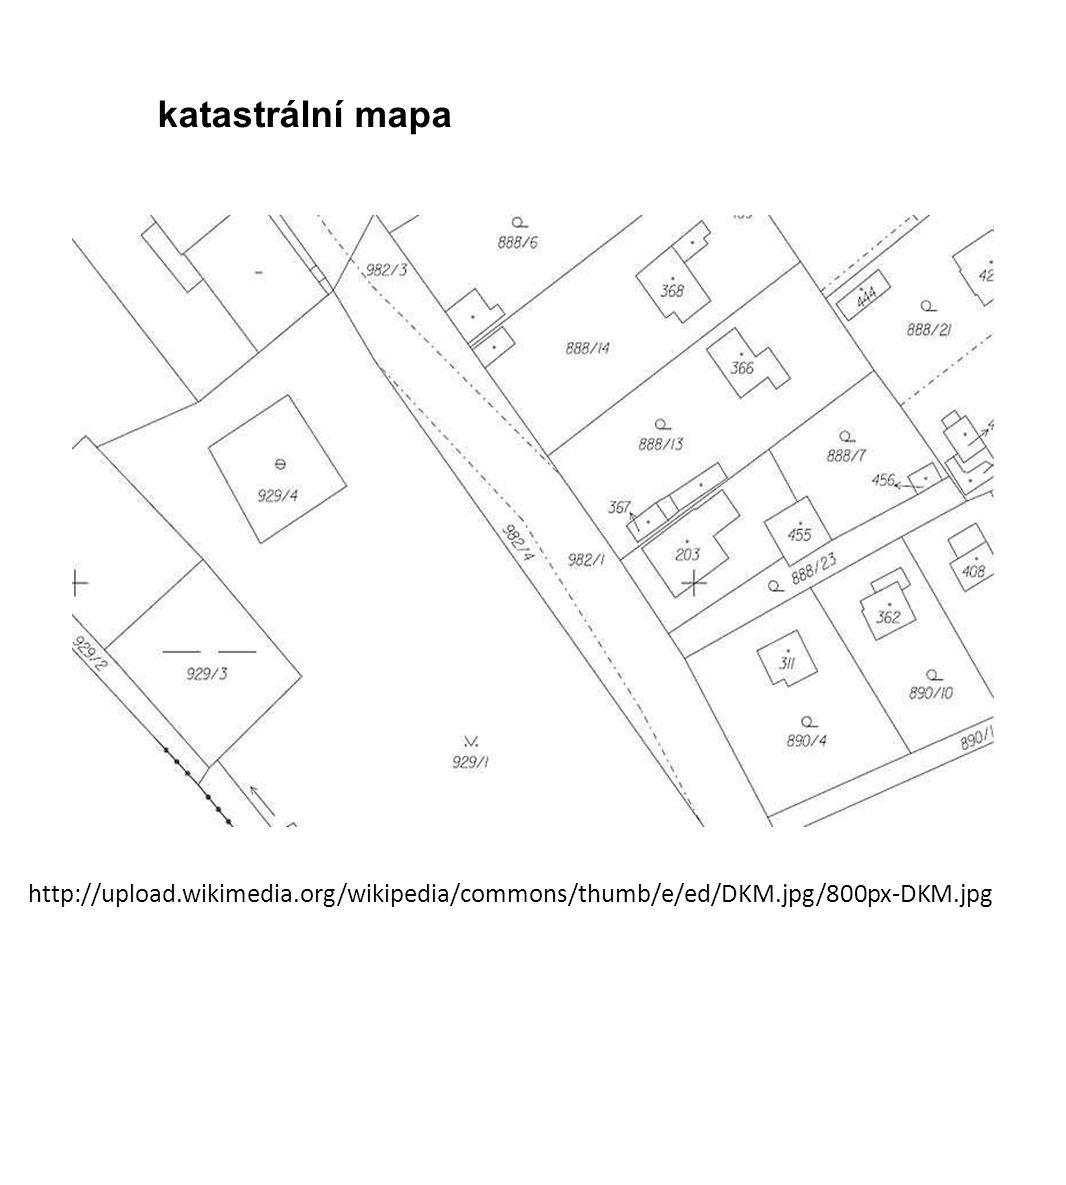 katastrální mapa http://upload.wikimedia.org/wikipedia/commons/thumb/e/ed/DKM.jpg/800px-DKM.jpg